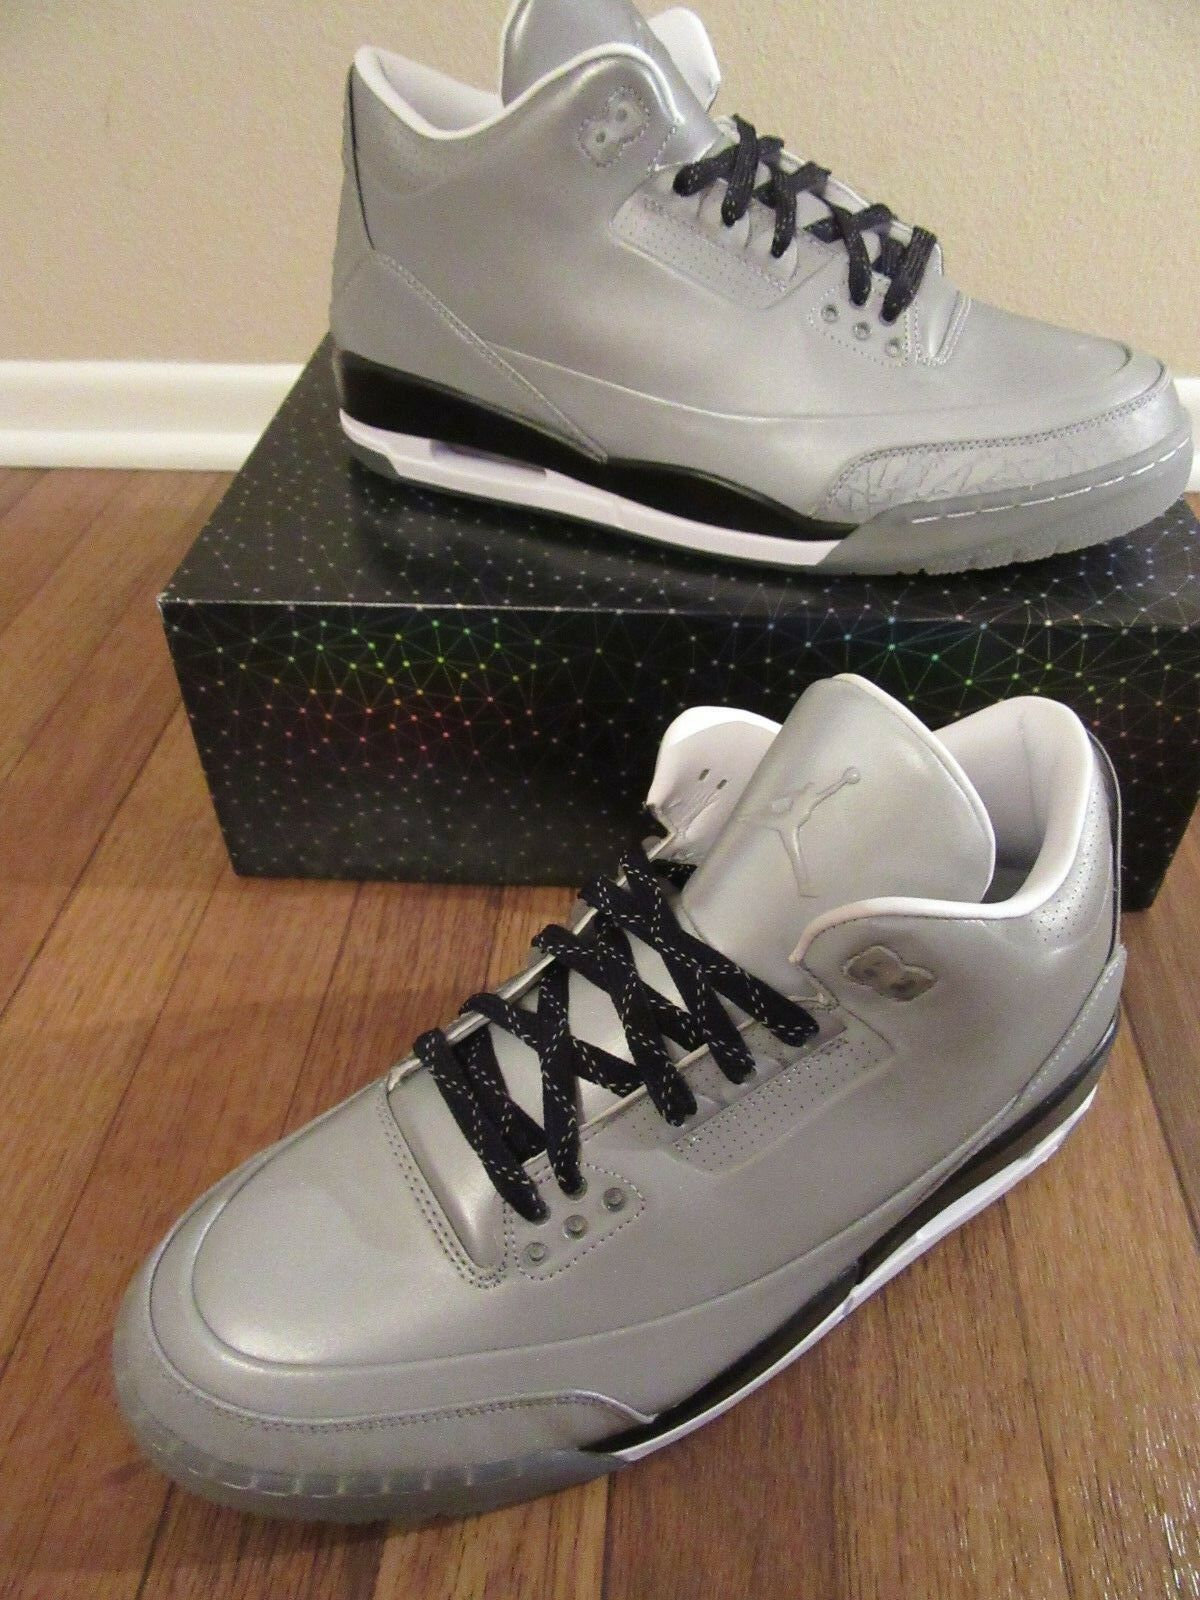 Nike air jordan 5lab3 dimensioni riflettono silver bianco nero 631603 003 s new pennino